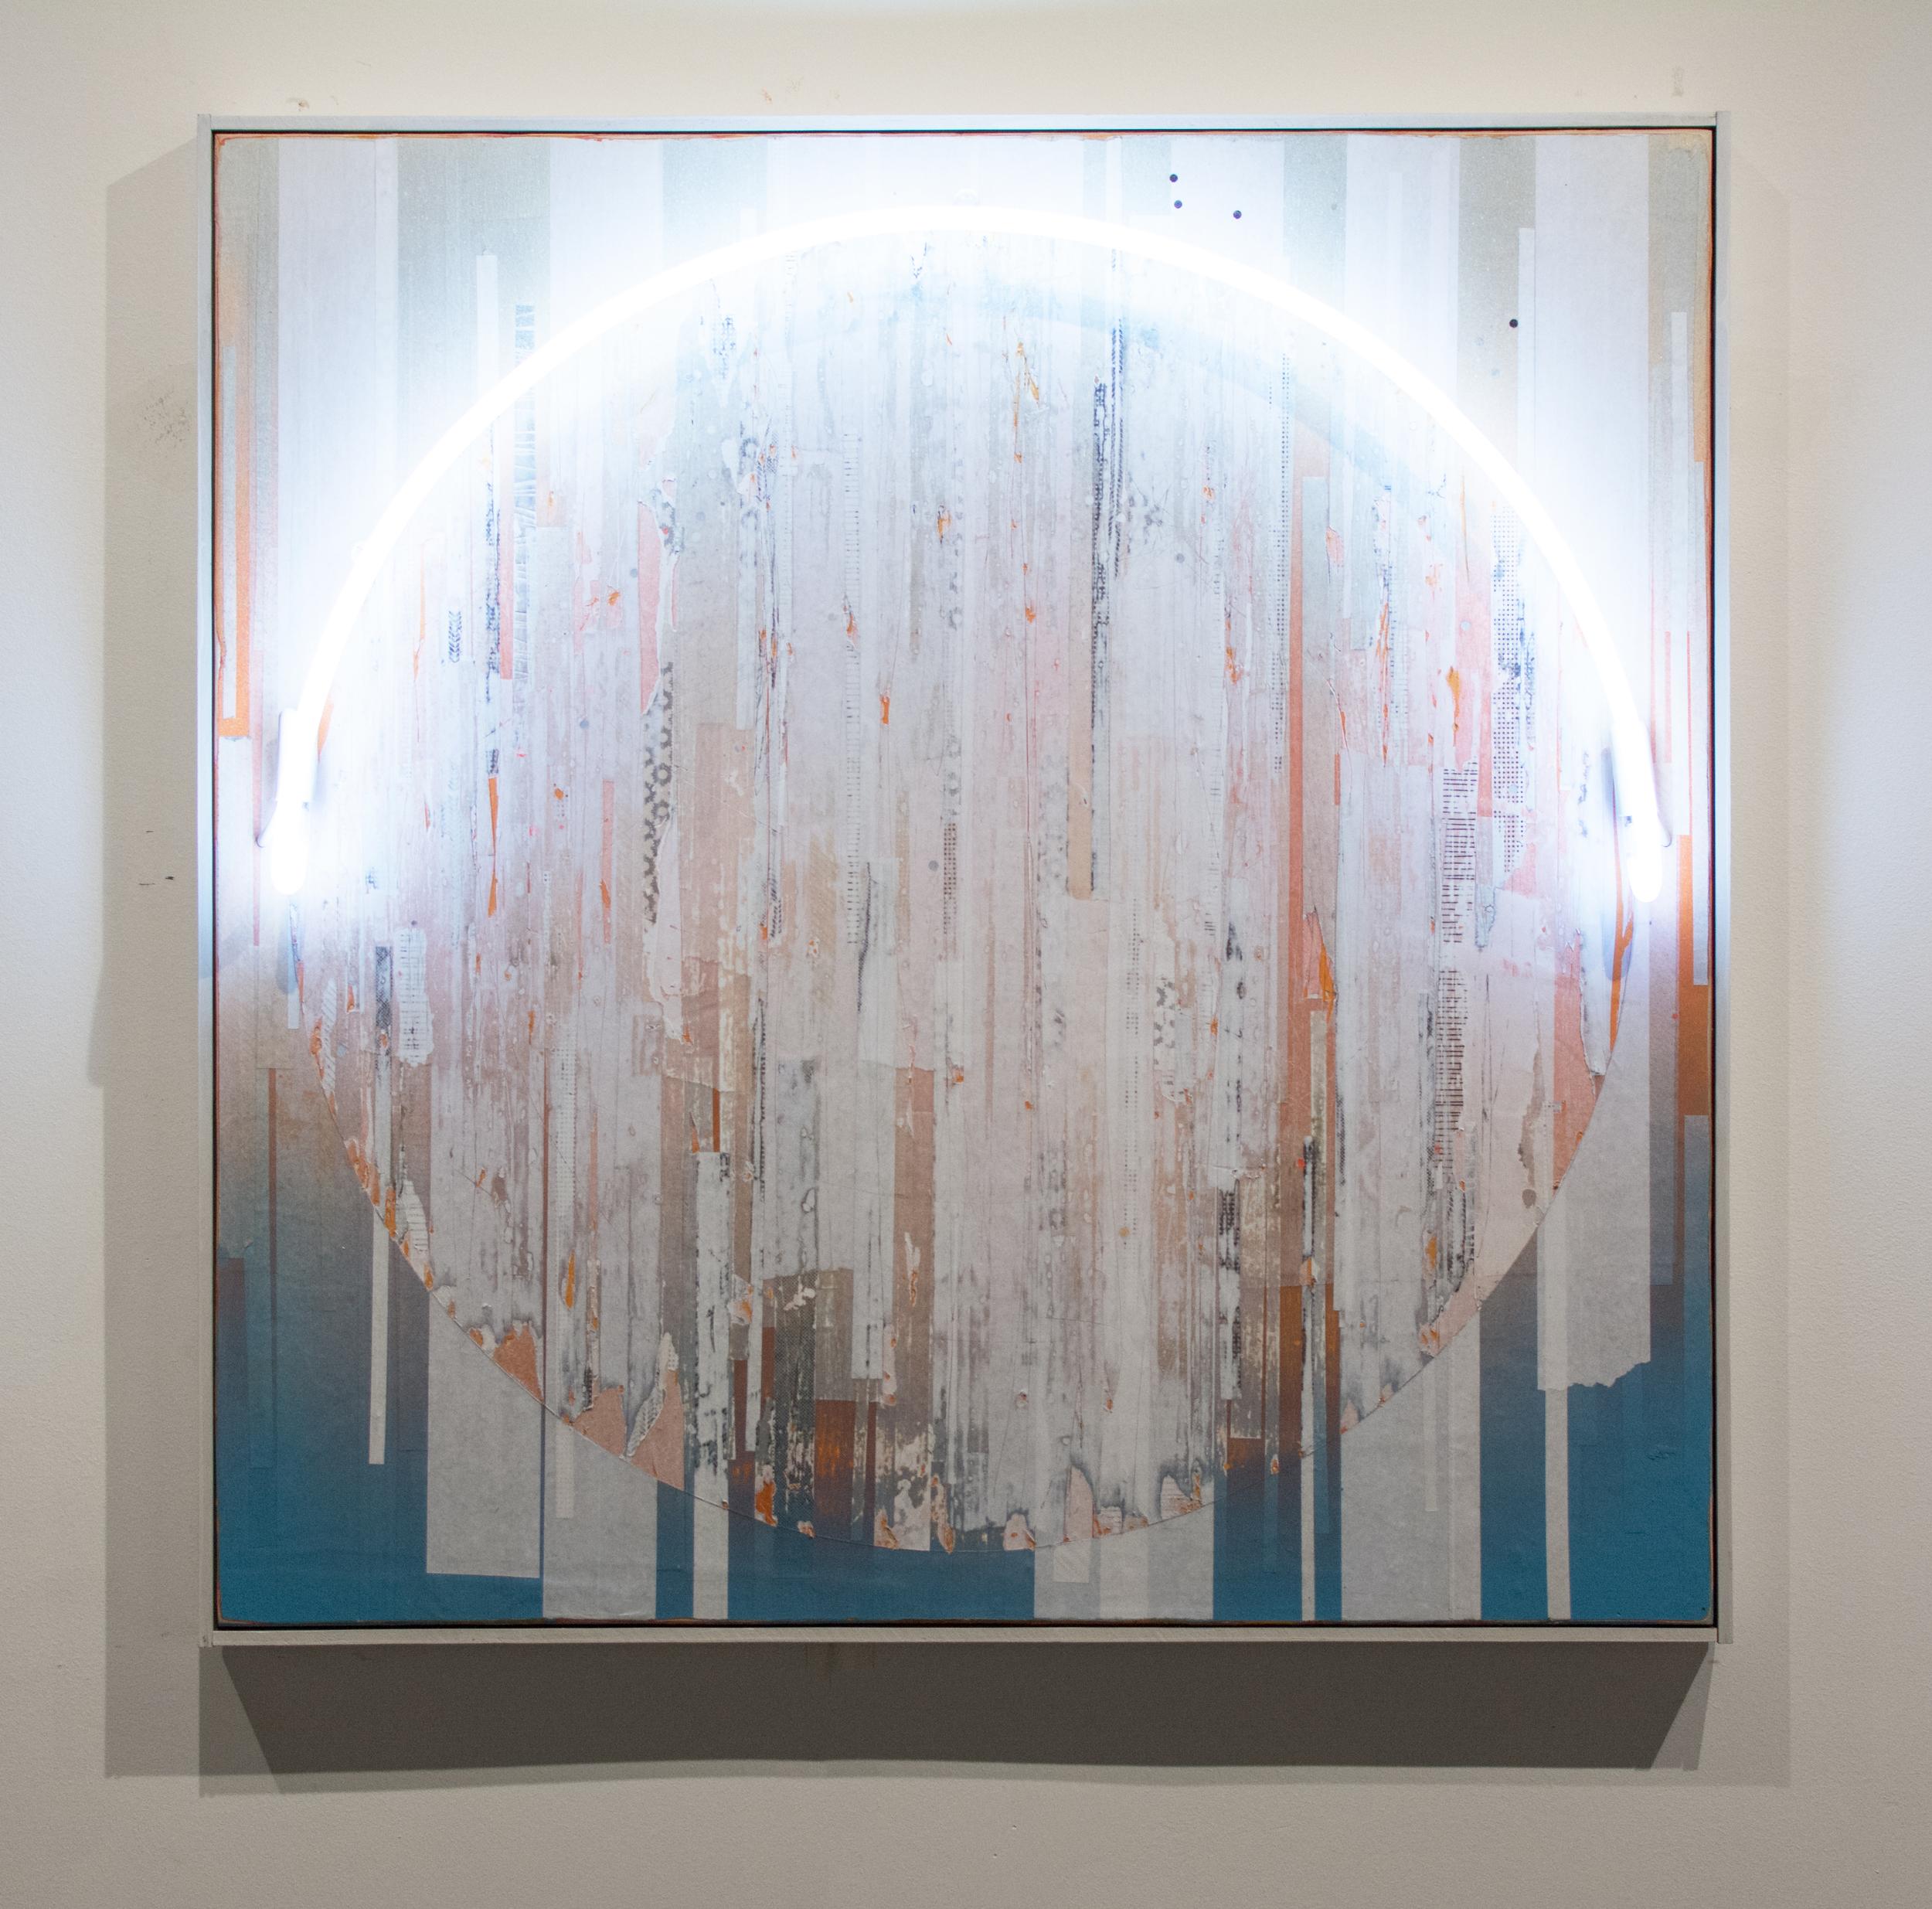 Erik Otto, Luminance, 2016. Enamel, acrylic, spray paint, paper and neon light on panel. 40 x 40. $4,500.